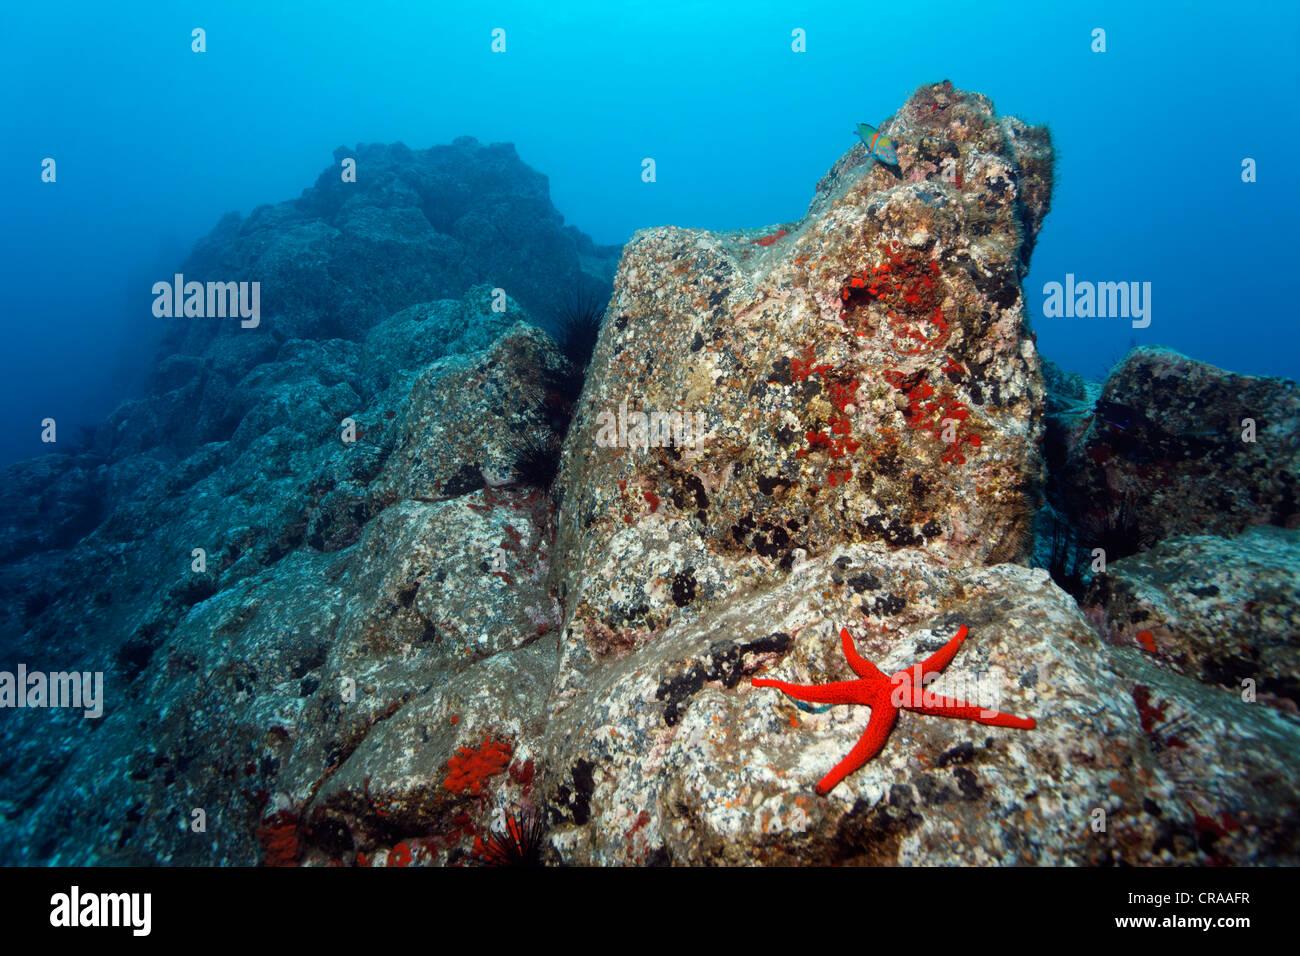 Paysages sous-marins rocheux, rouge, étoile de mer (Echinaster sepositus), Acorn balanes (Balanus trigonus), Photo Stock